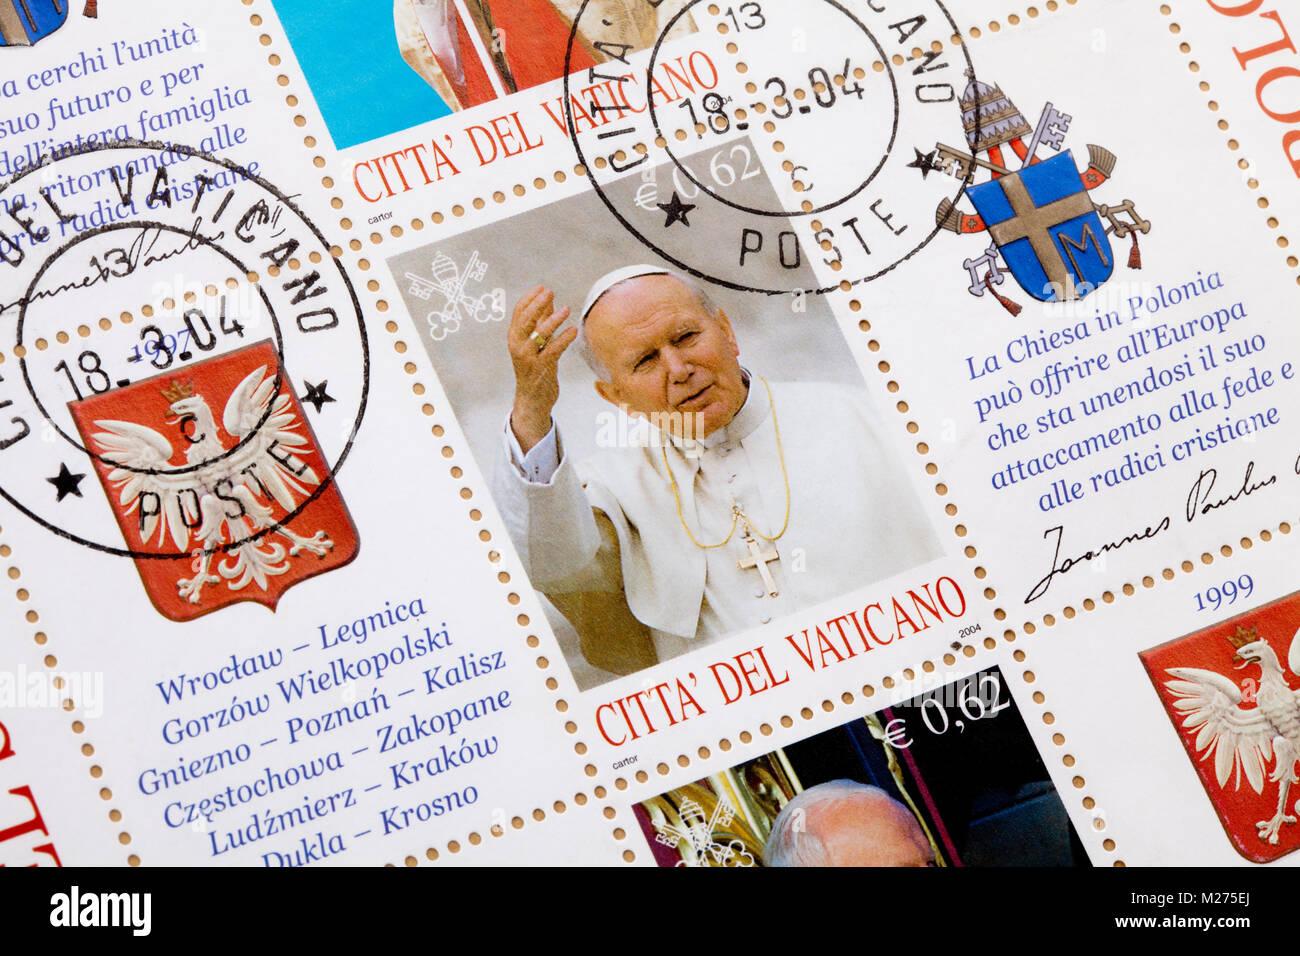 Stamps from the Vatican on a letter, Stamped, Vatican, Italy, Europe, Gestempelte Briefmarken aus dem Vatikan, Johannes Stock Photo